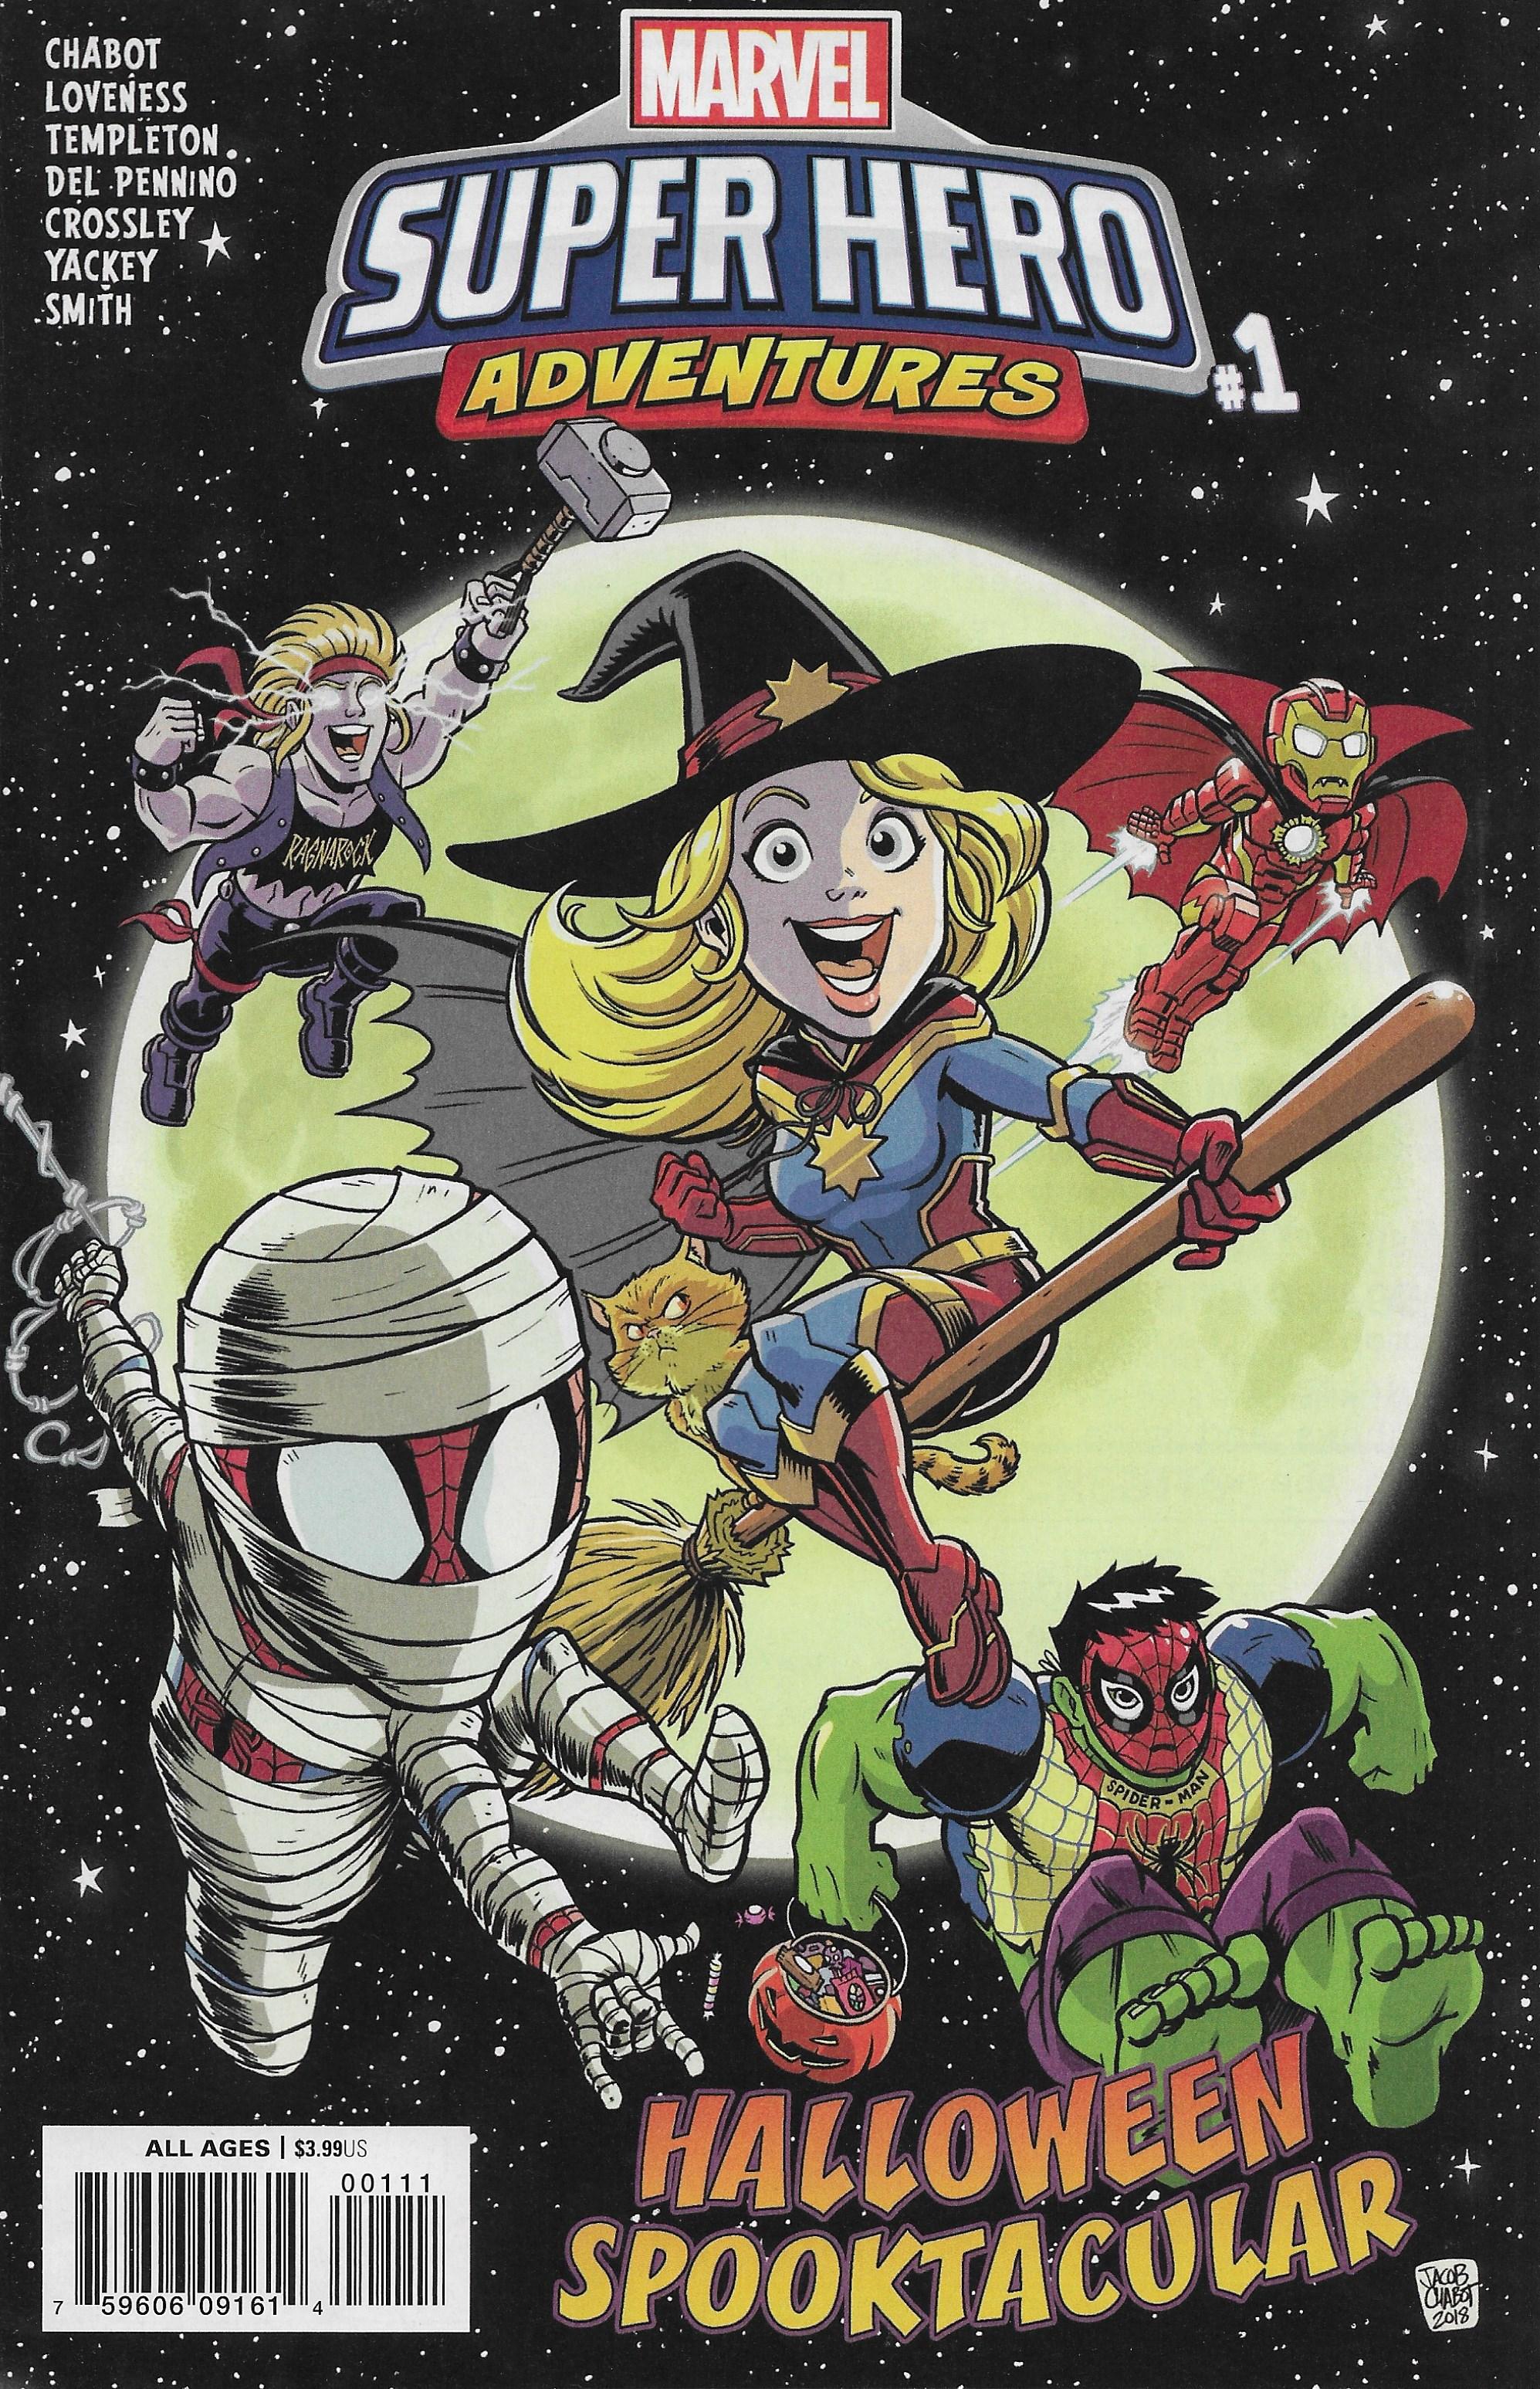 Marvel Super Hero Adventures: Captain Marvel - Halloween Spooktacular #1 (2018)